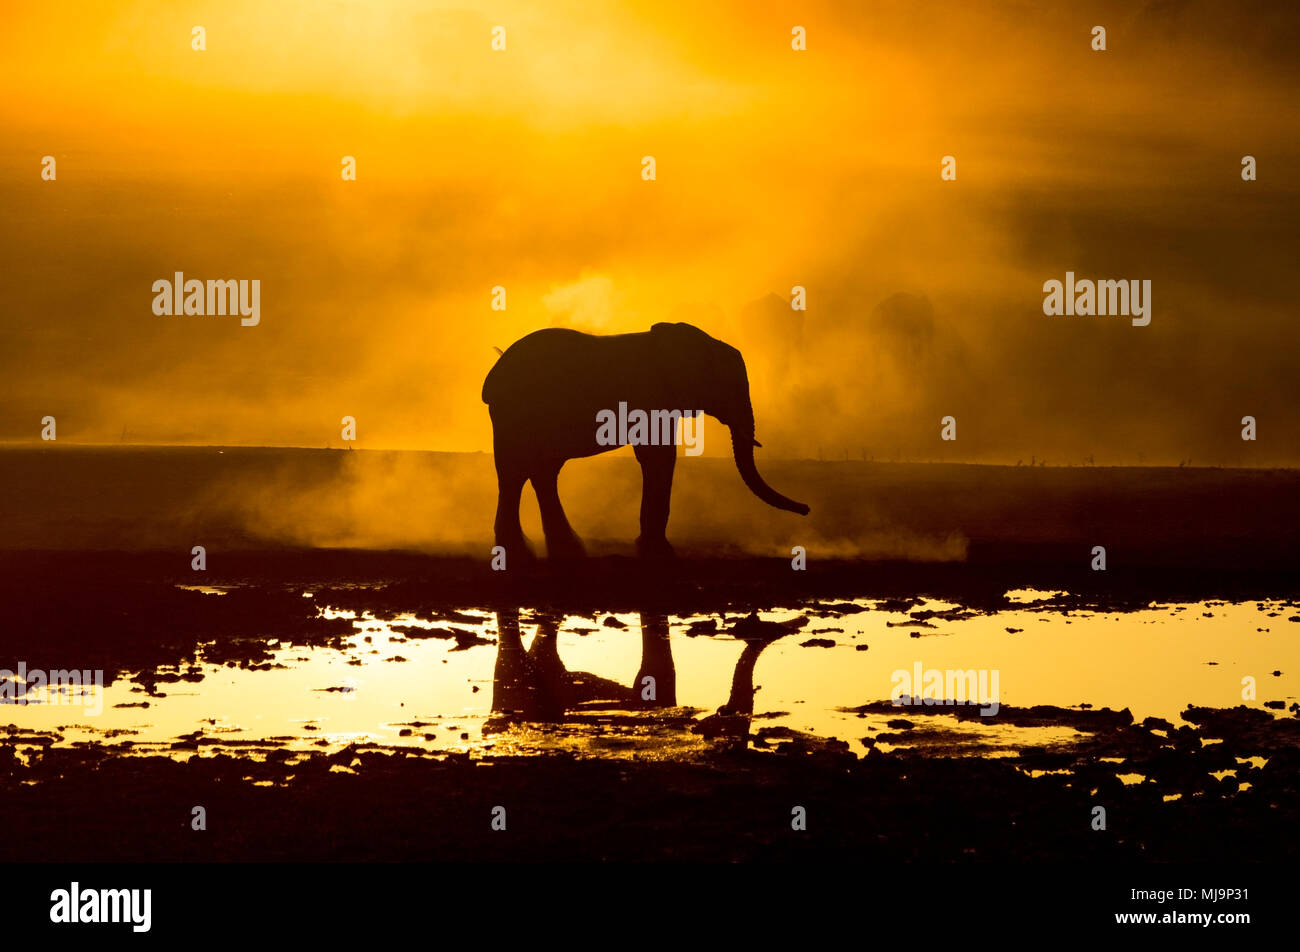 Afrikanische Elefanten vor der Silhouette Sonnenuntergang Stockbild